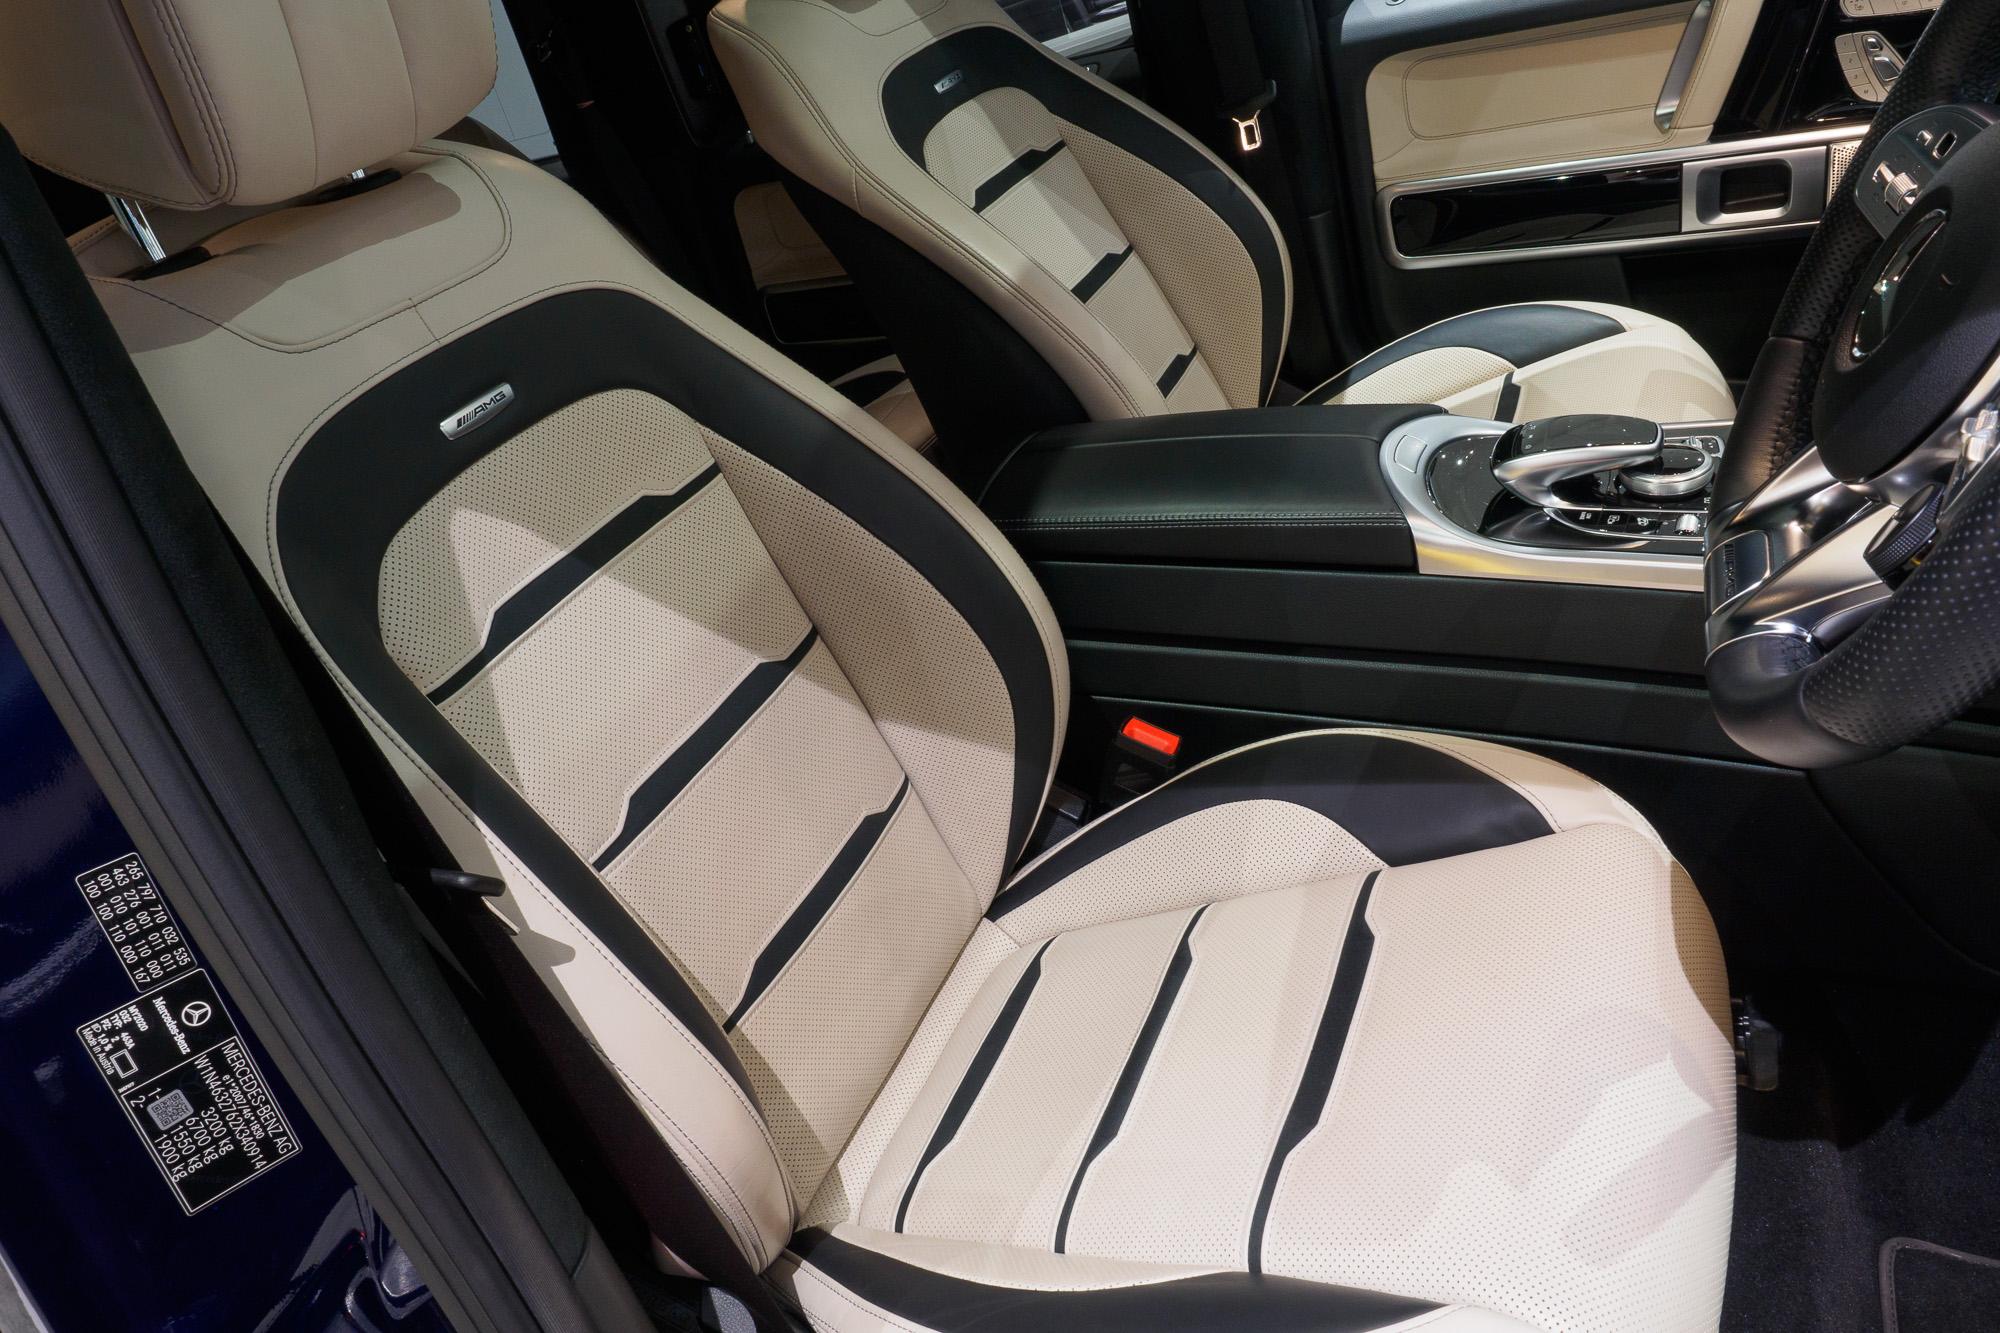 Mercedes G63 AMG-9